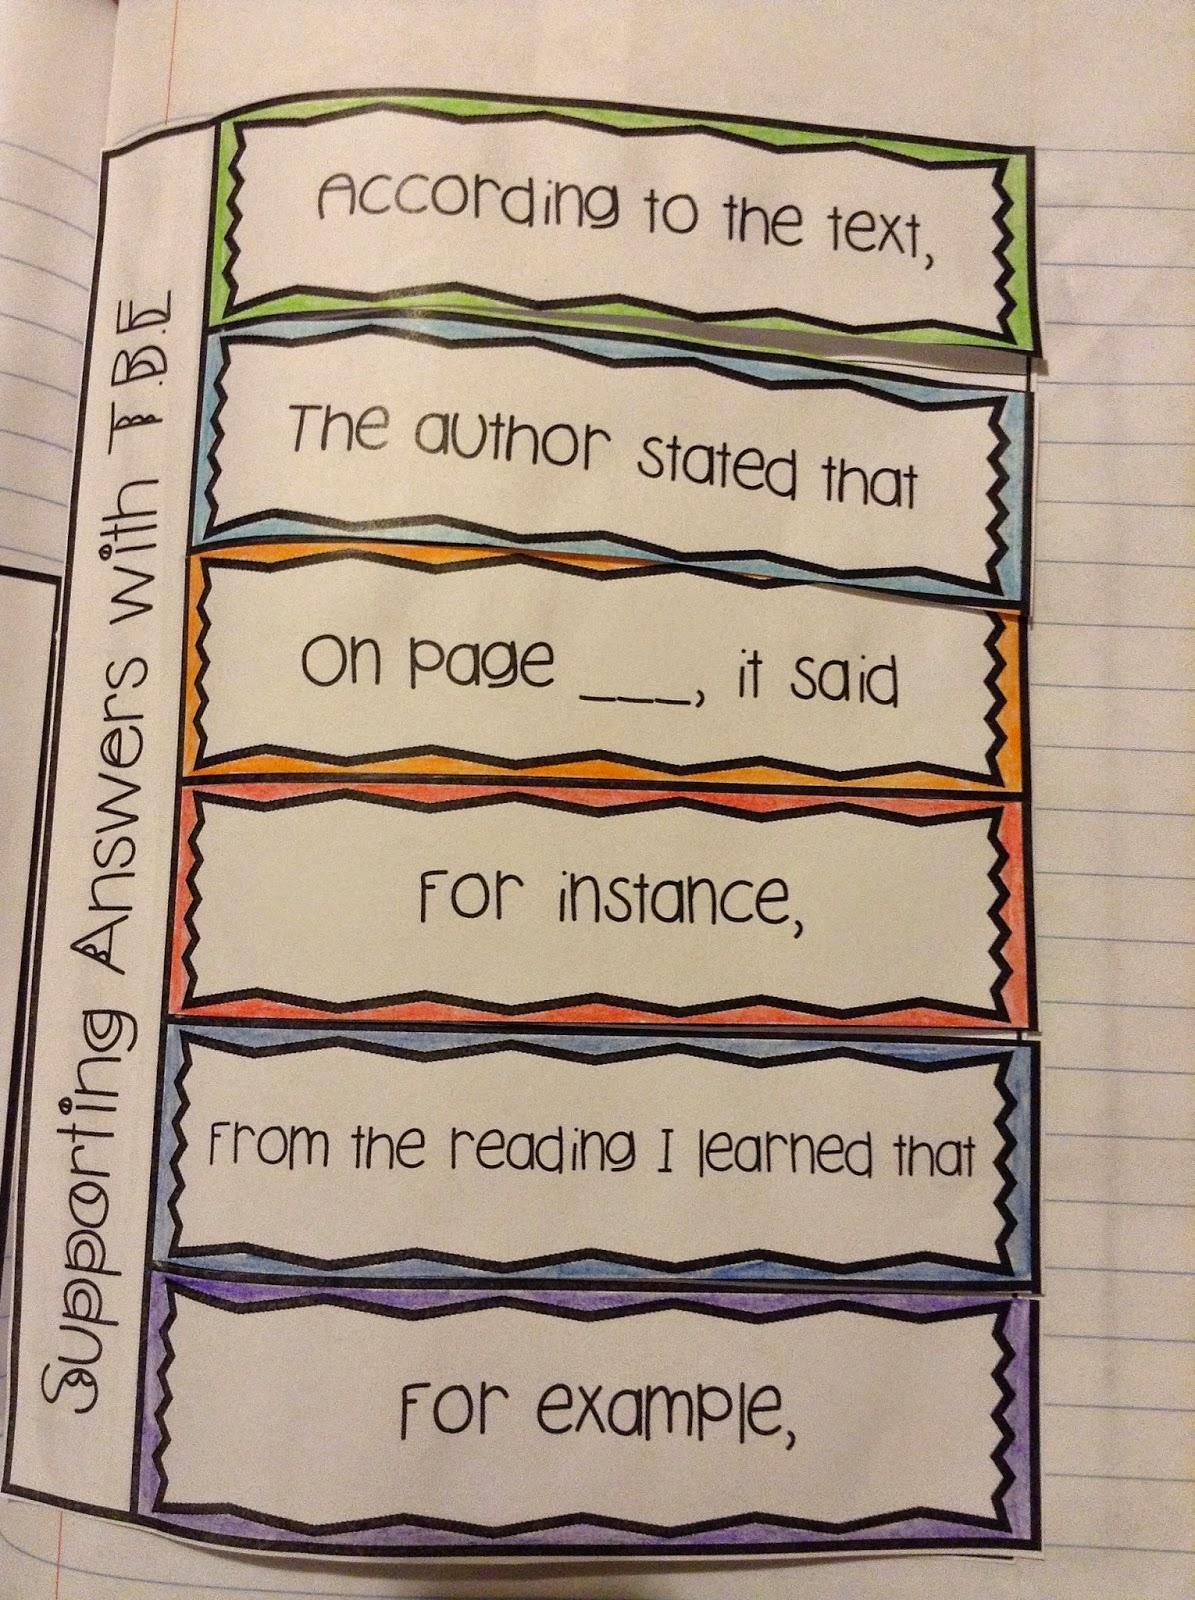 Upper Grades Mentor Text Lesson Text Based Evidence 4 Rl1